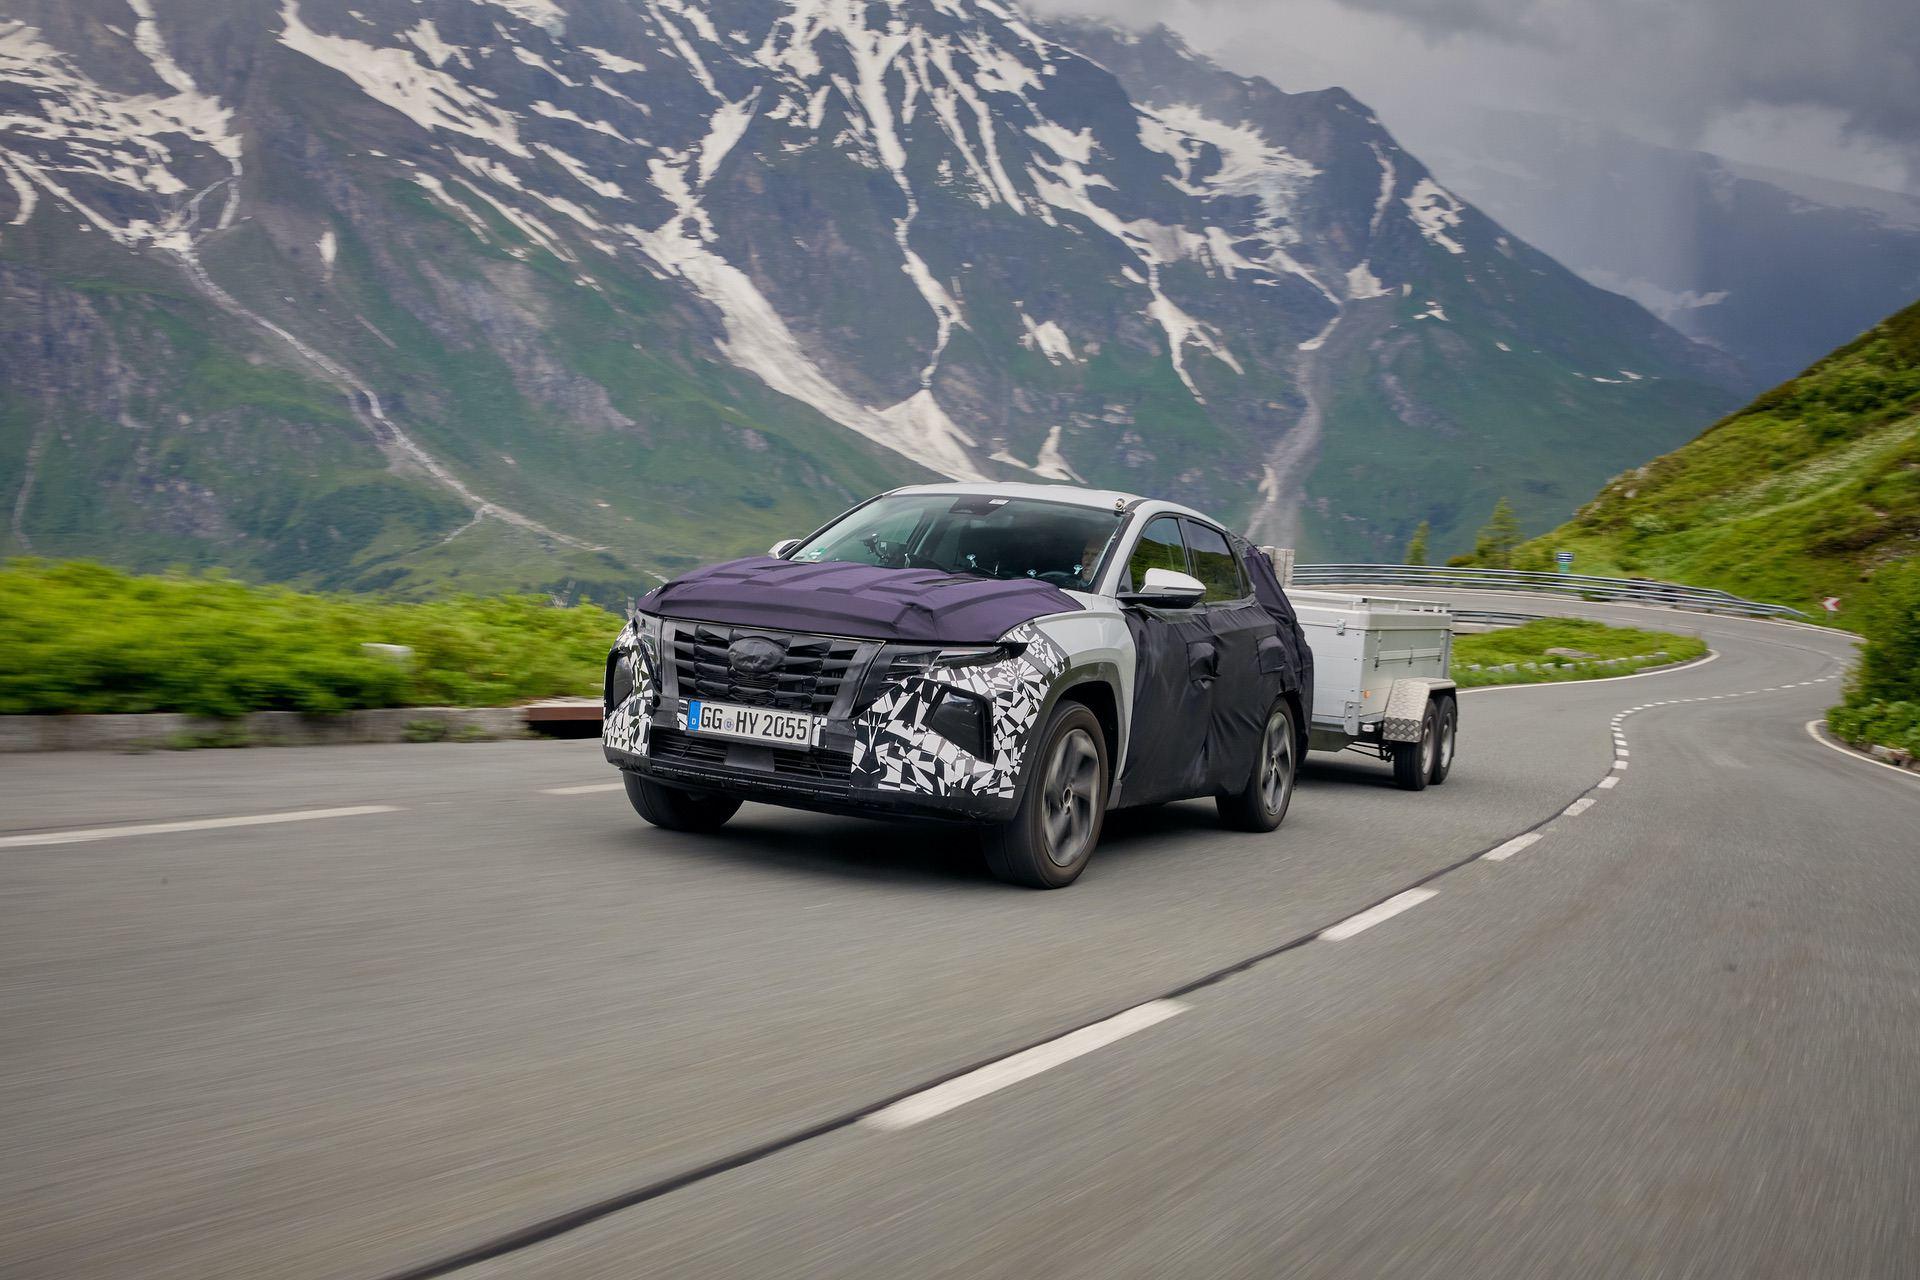 all-new-Hyundai-Tucson-trailer-testing-4